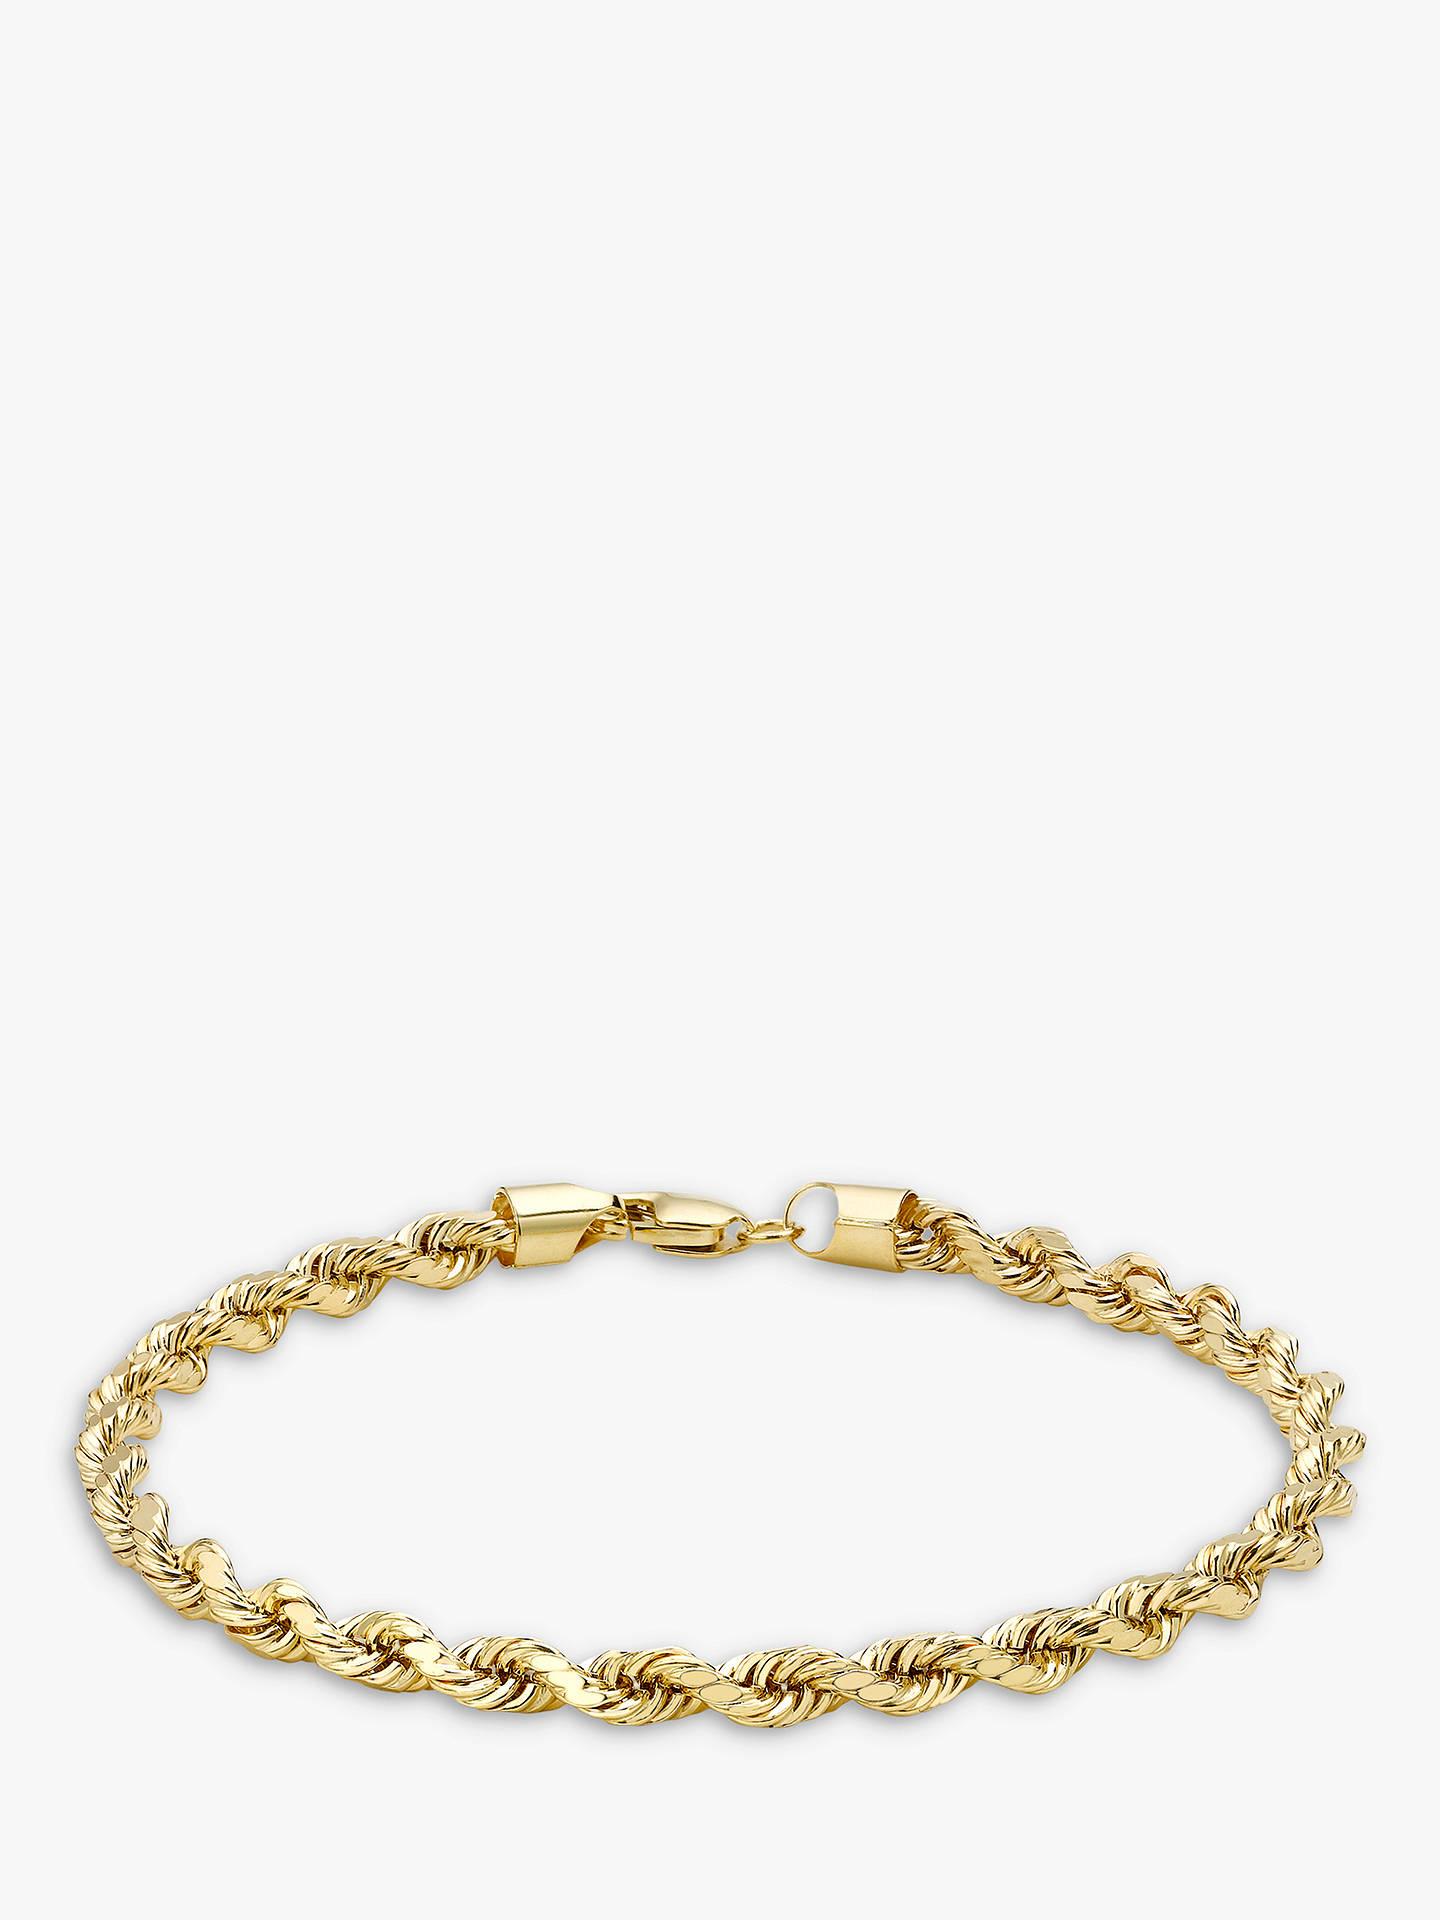 Ibb 9ct Yellow Gold Hollow Diamond Cut Rope Bracelet Online At Johnlewis